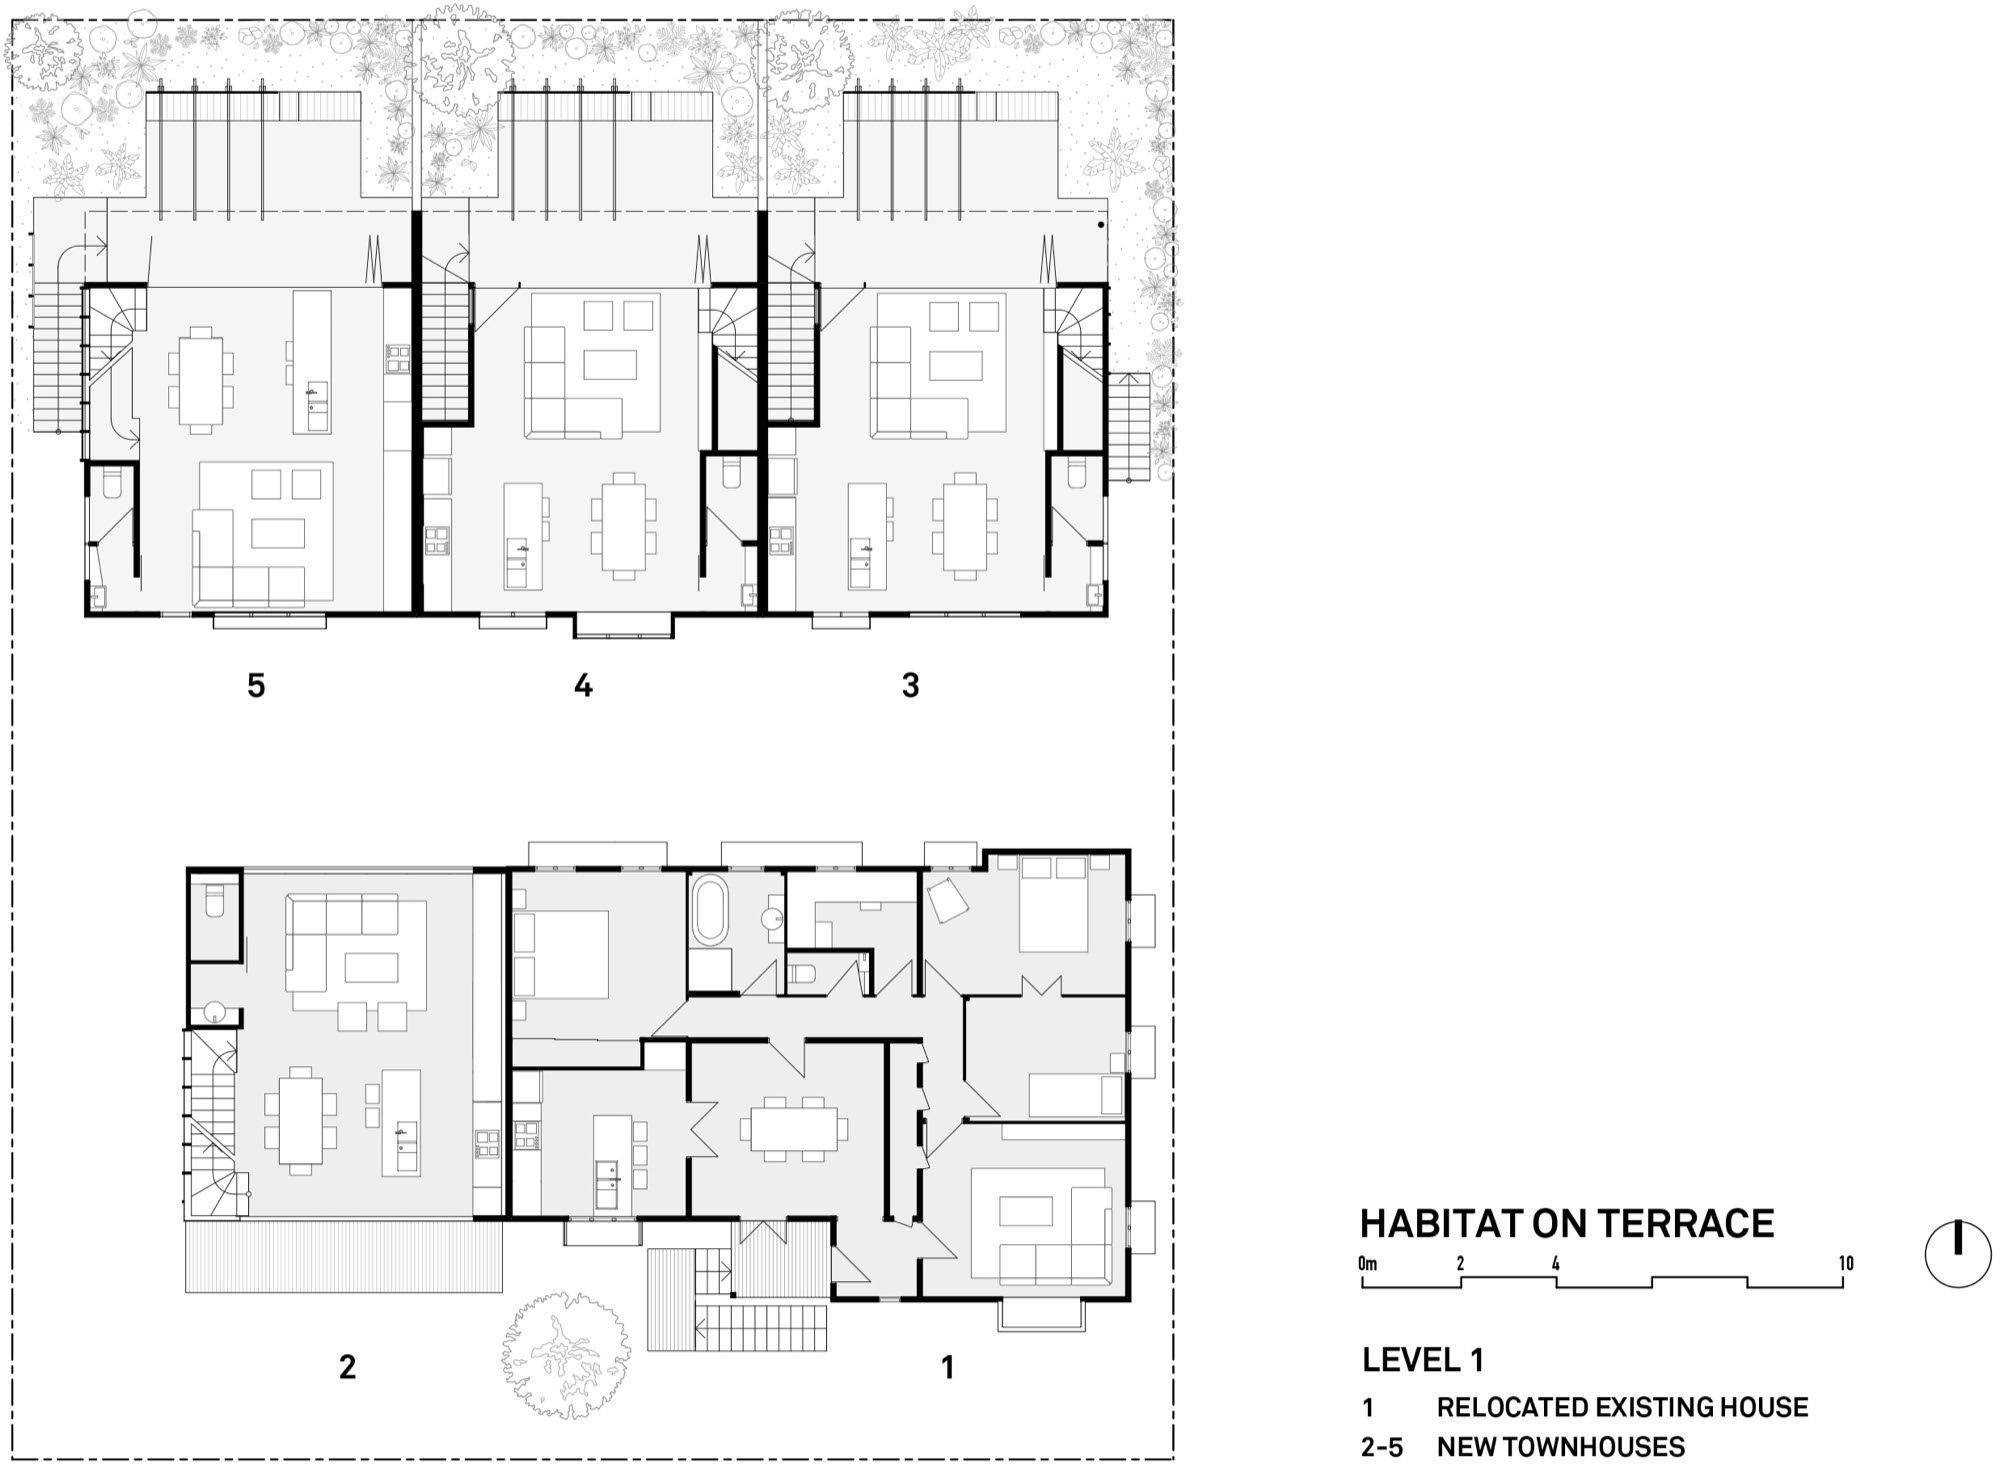 Gallery of Habitat on Terrace / refresh*design - 14